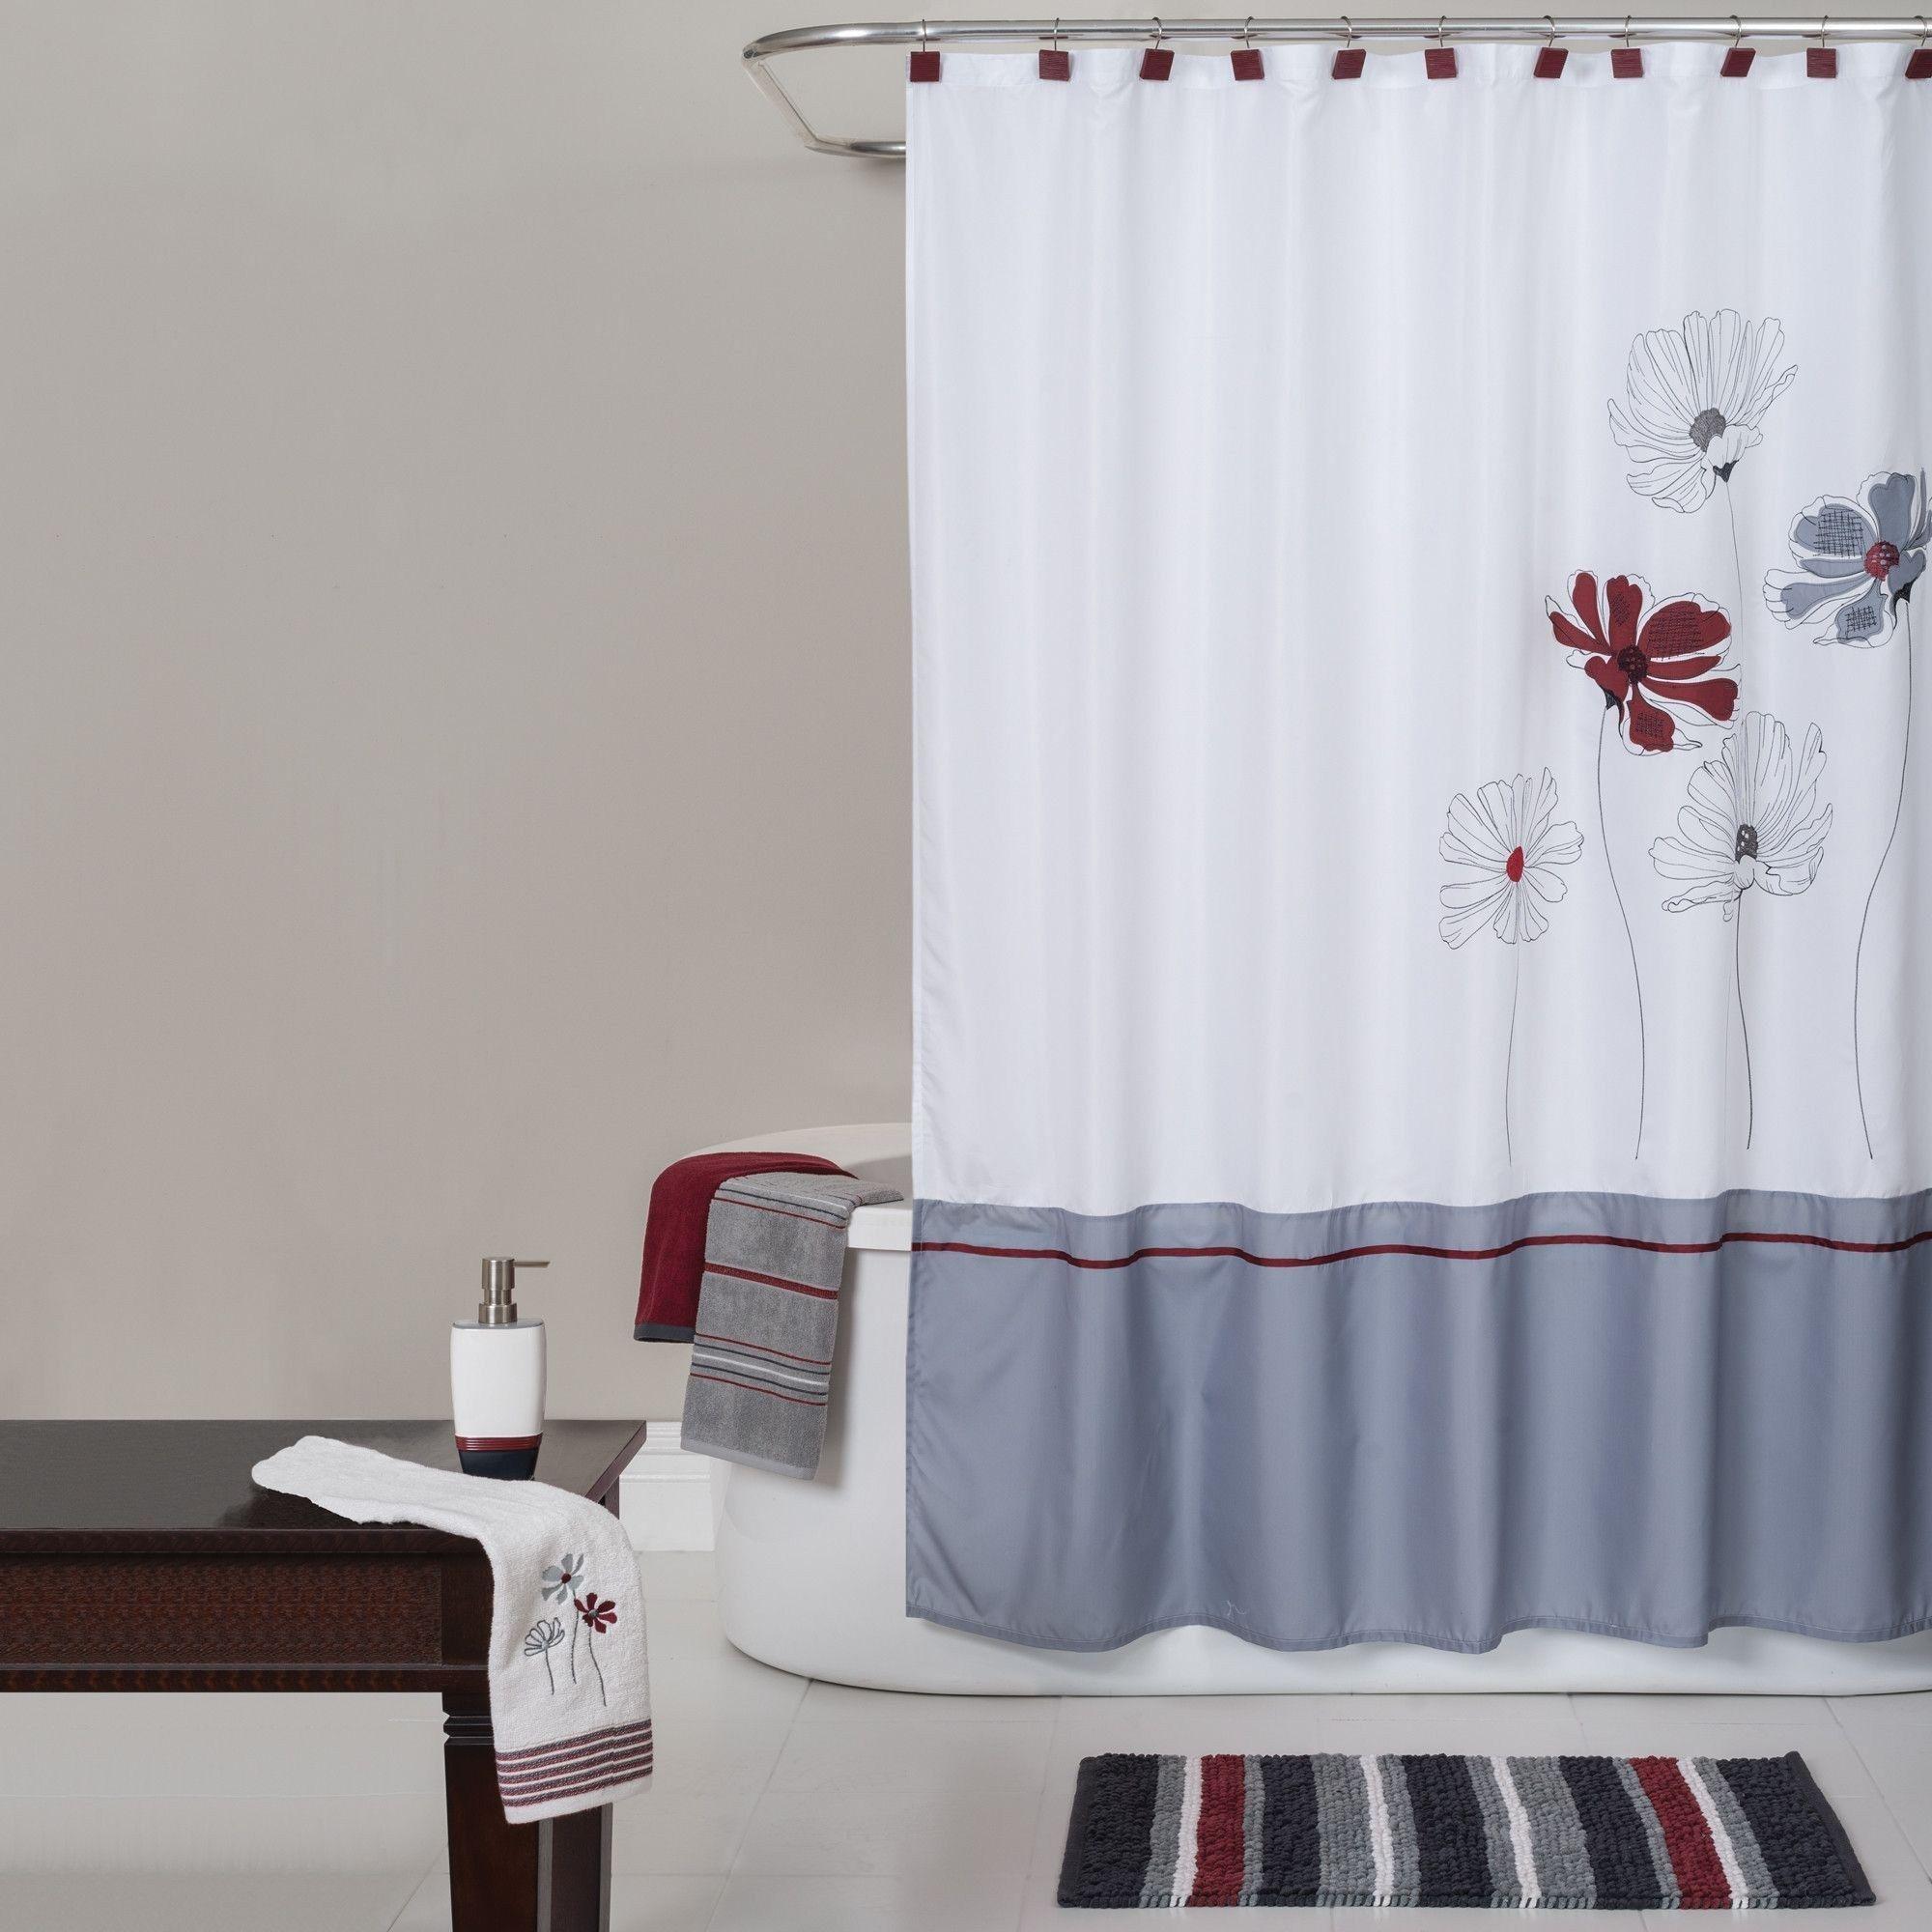 Elegant Red Striped Shower Curtain